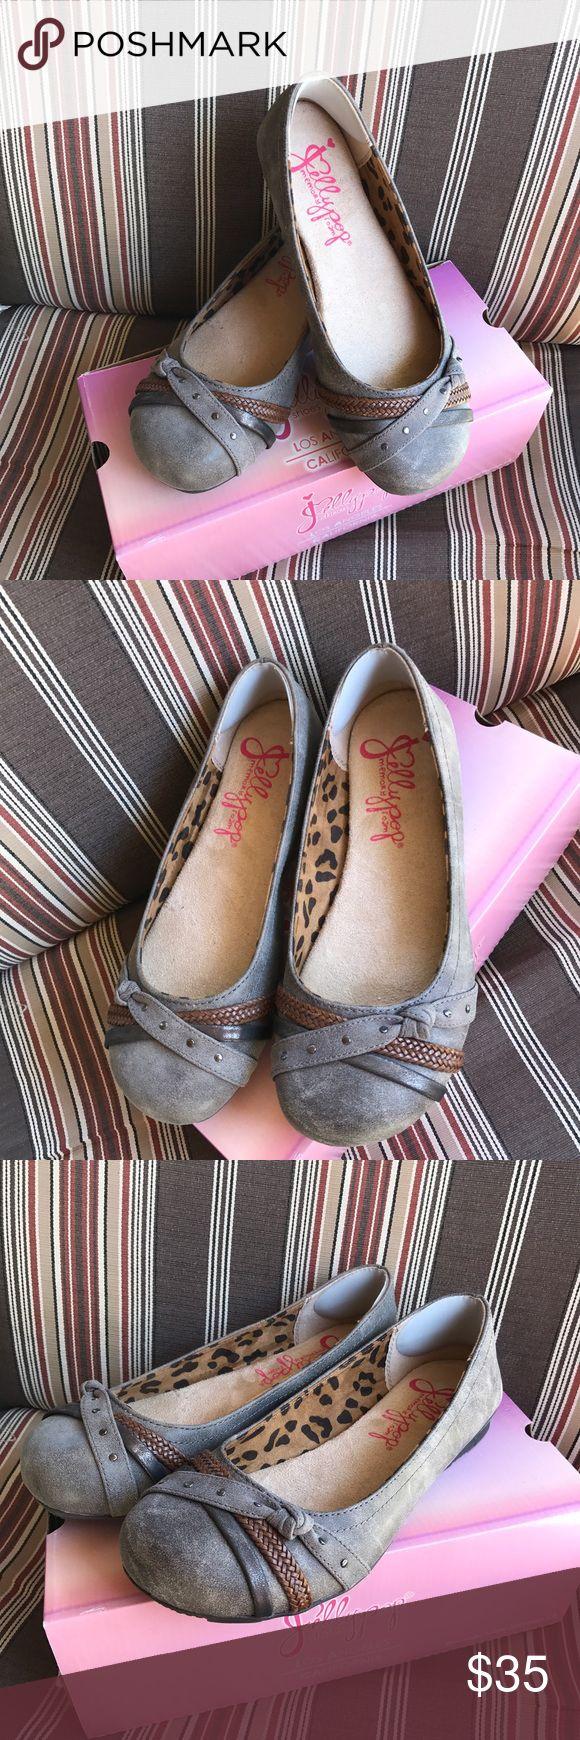 NWOT Jellypop flats Memory foam trendy flats. NWOT!!! Super cute and comfy!! Jellypop Shoes Flats & Loafers